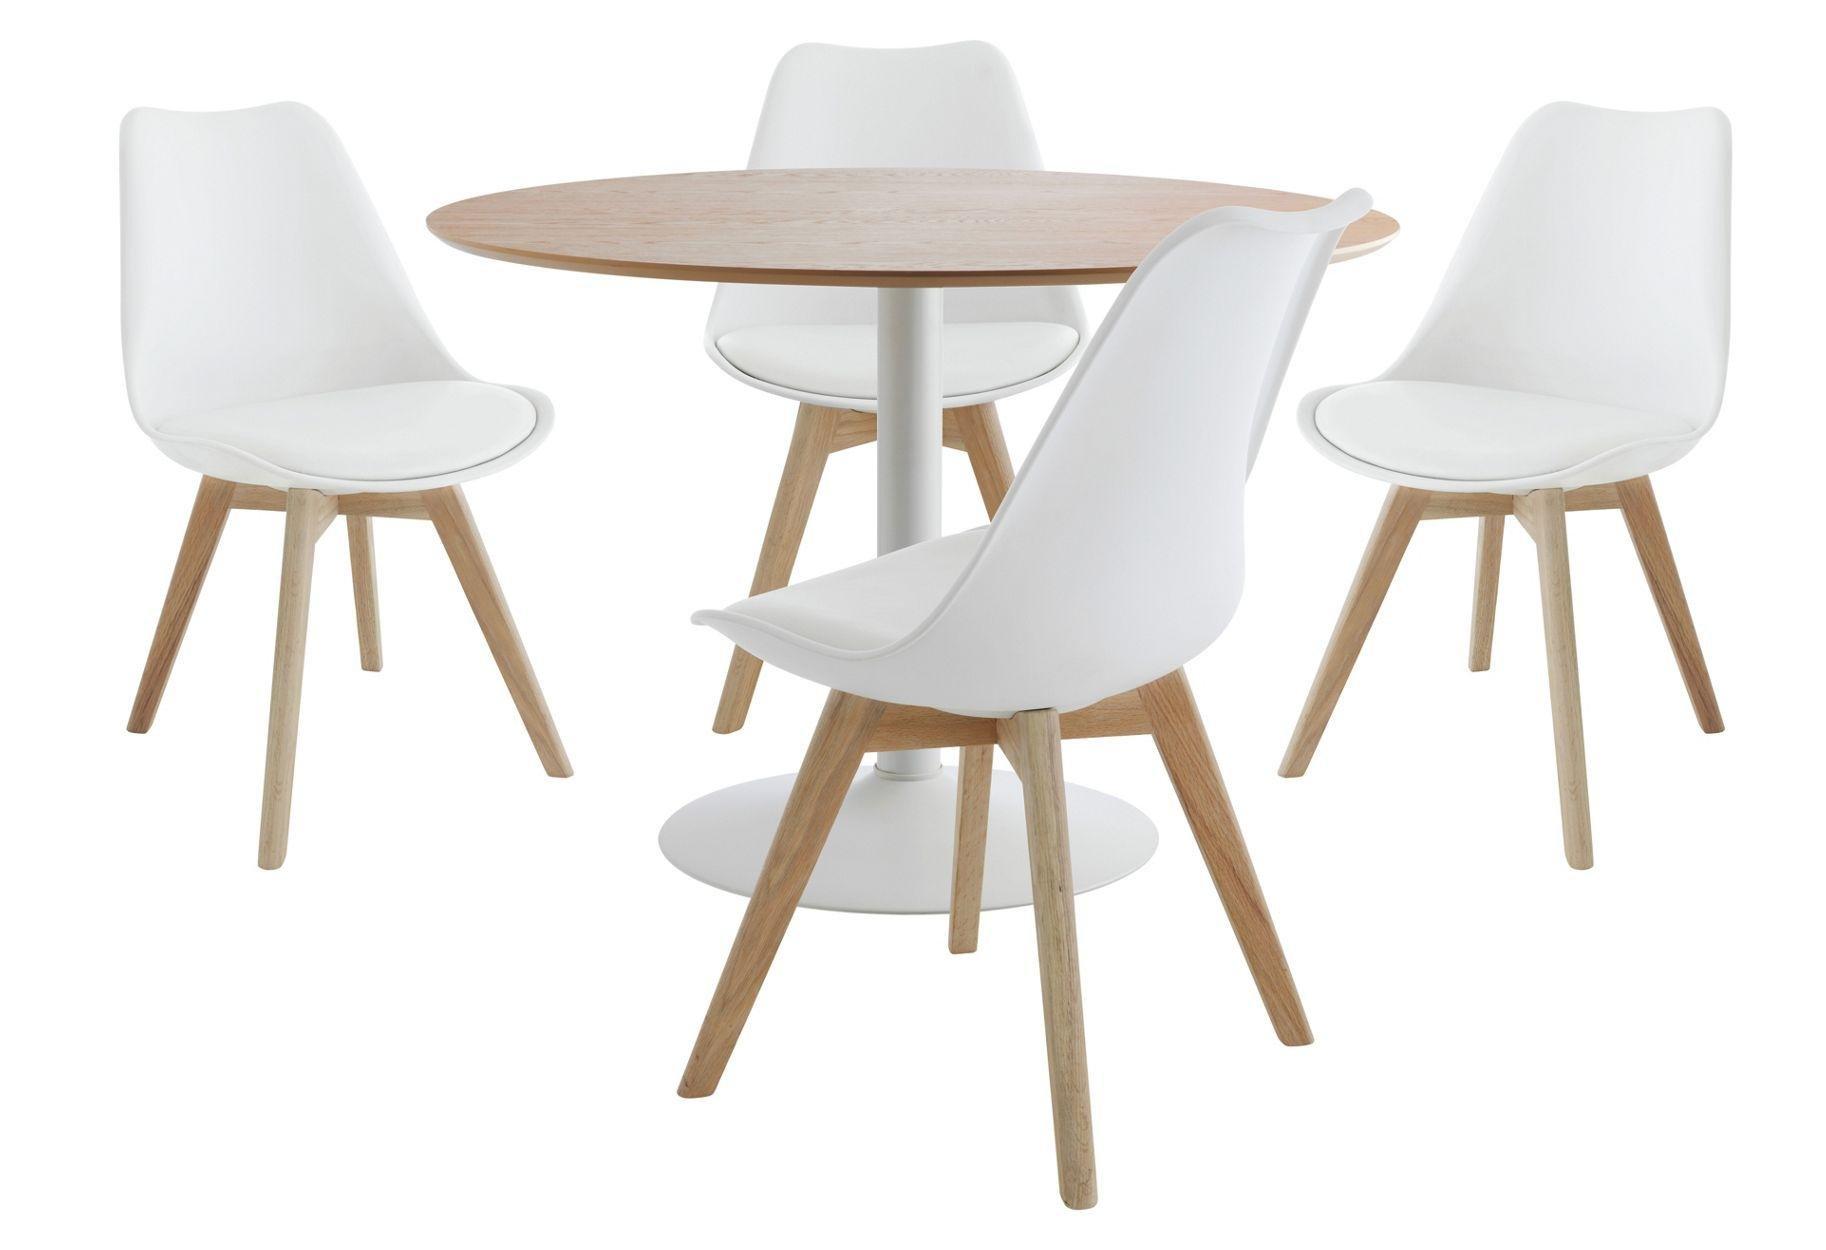 Buy Habitat Dining Set Lance Table and 4 Jerry Chairs Oak  : 4649302RZ001Webampw570amph513ampWebPDPBadge570amptoprightemptyampbottomleftempty from www.argos.co.uk size 570 x 513 jpeg 19kB